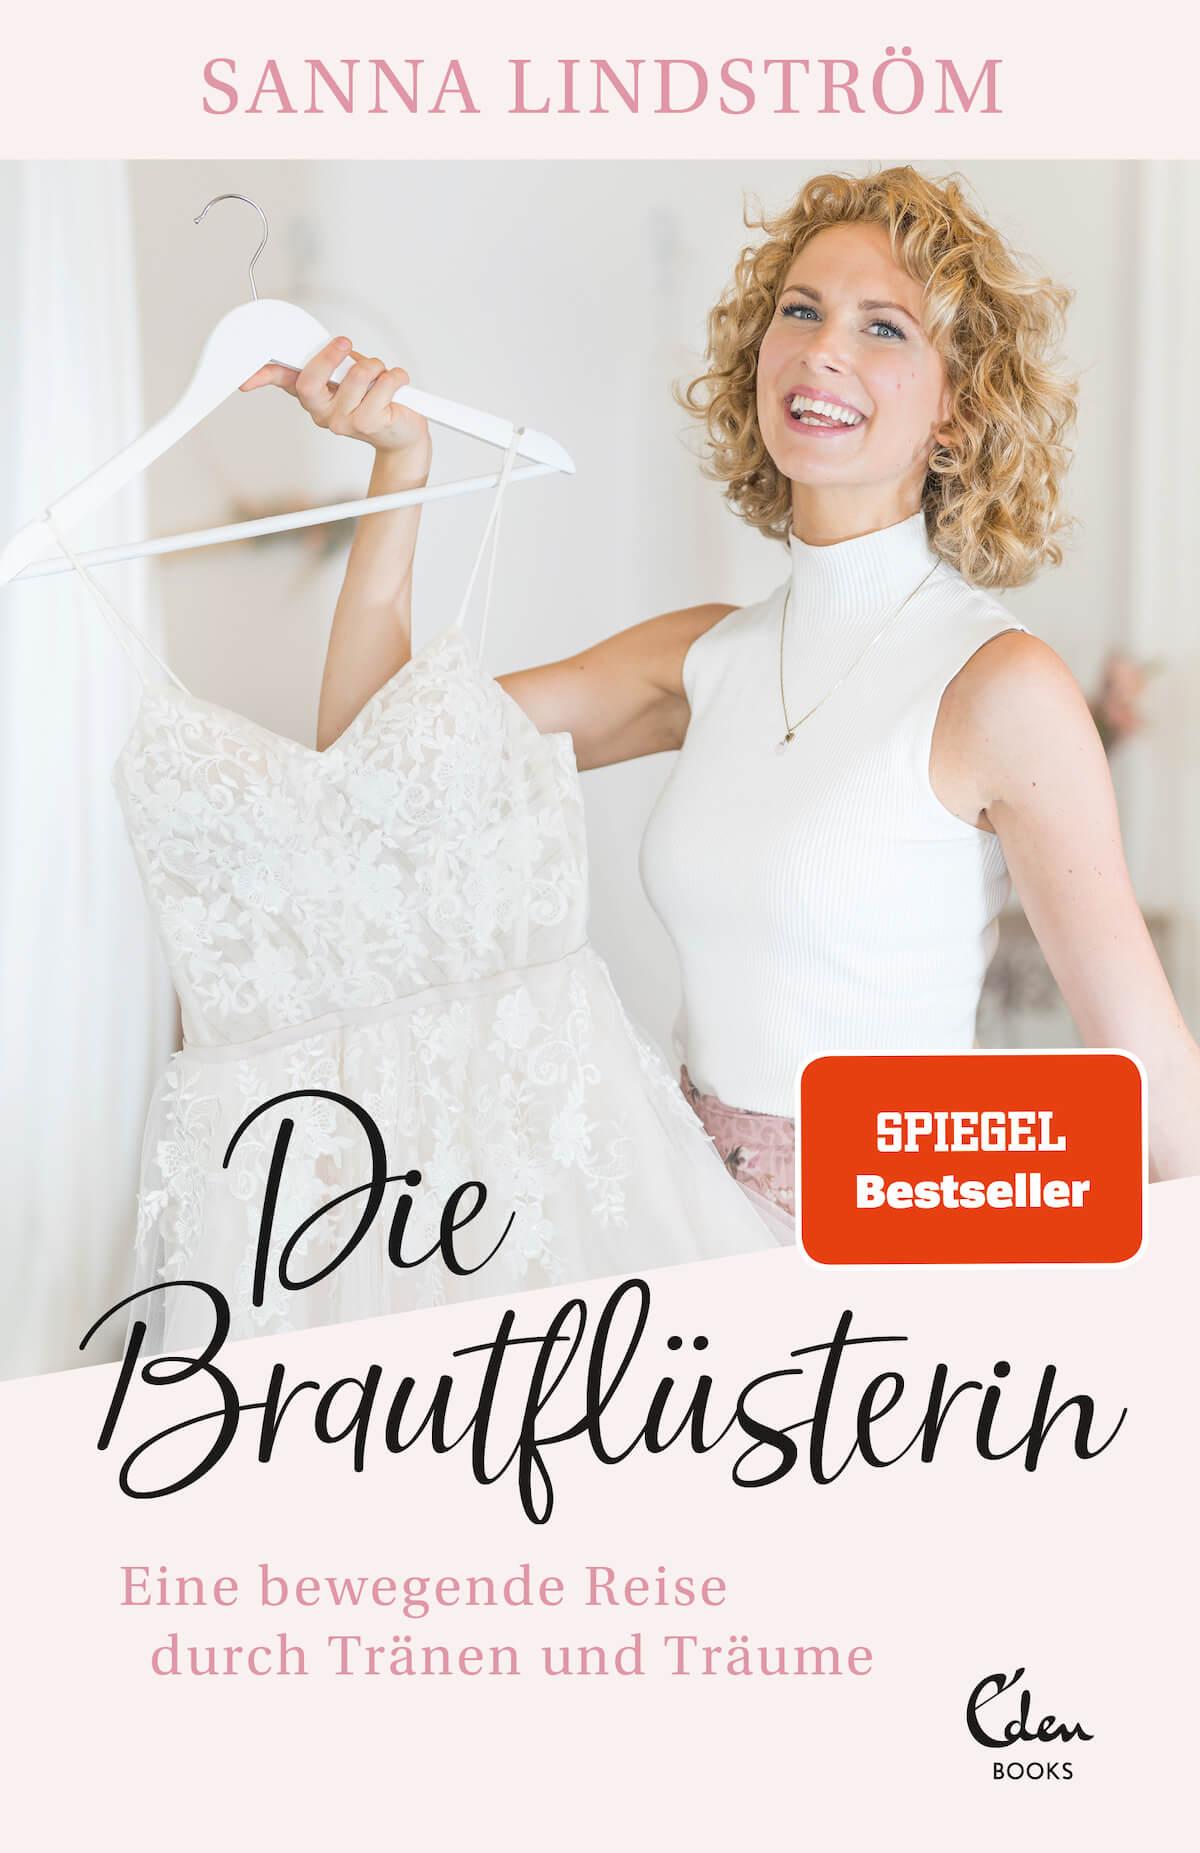 Sanna Lindström Cover